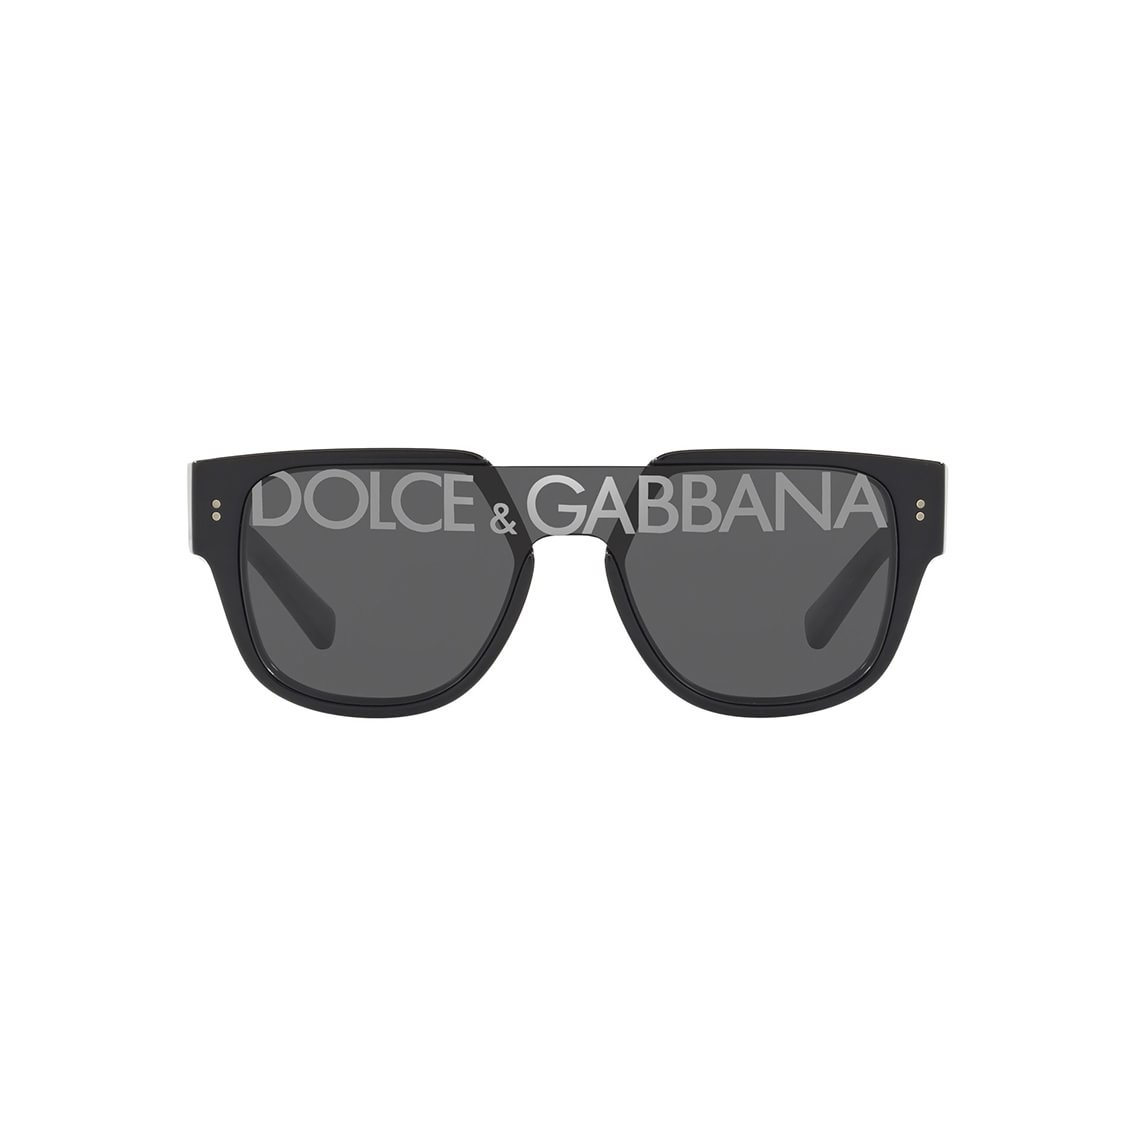 Dolce & Gabbana 0DG4356 22 501/M